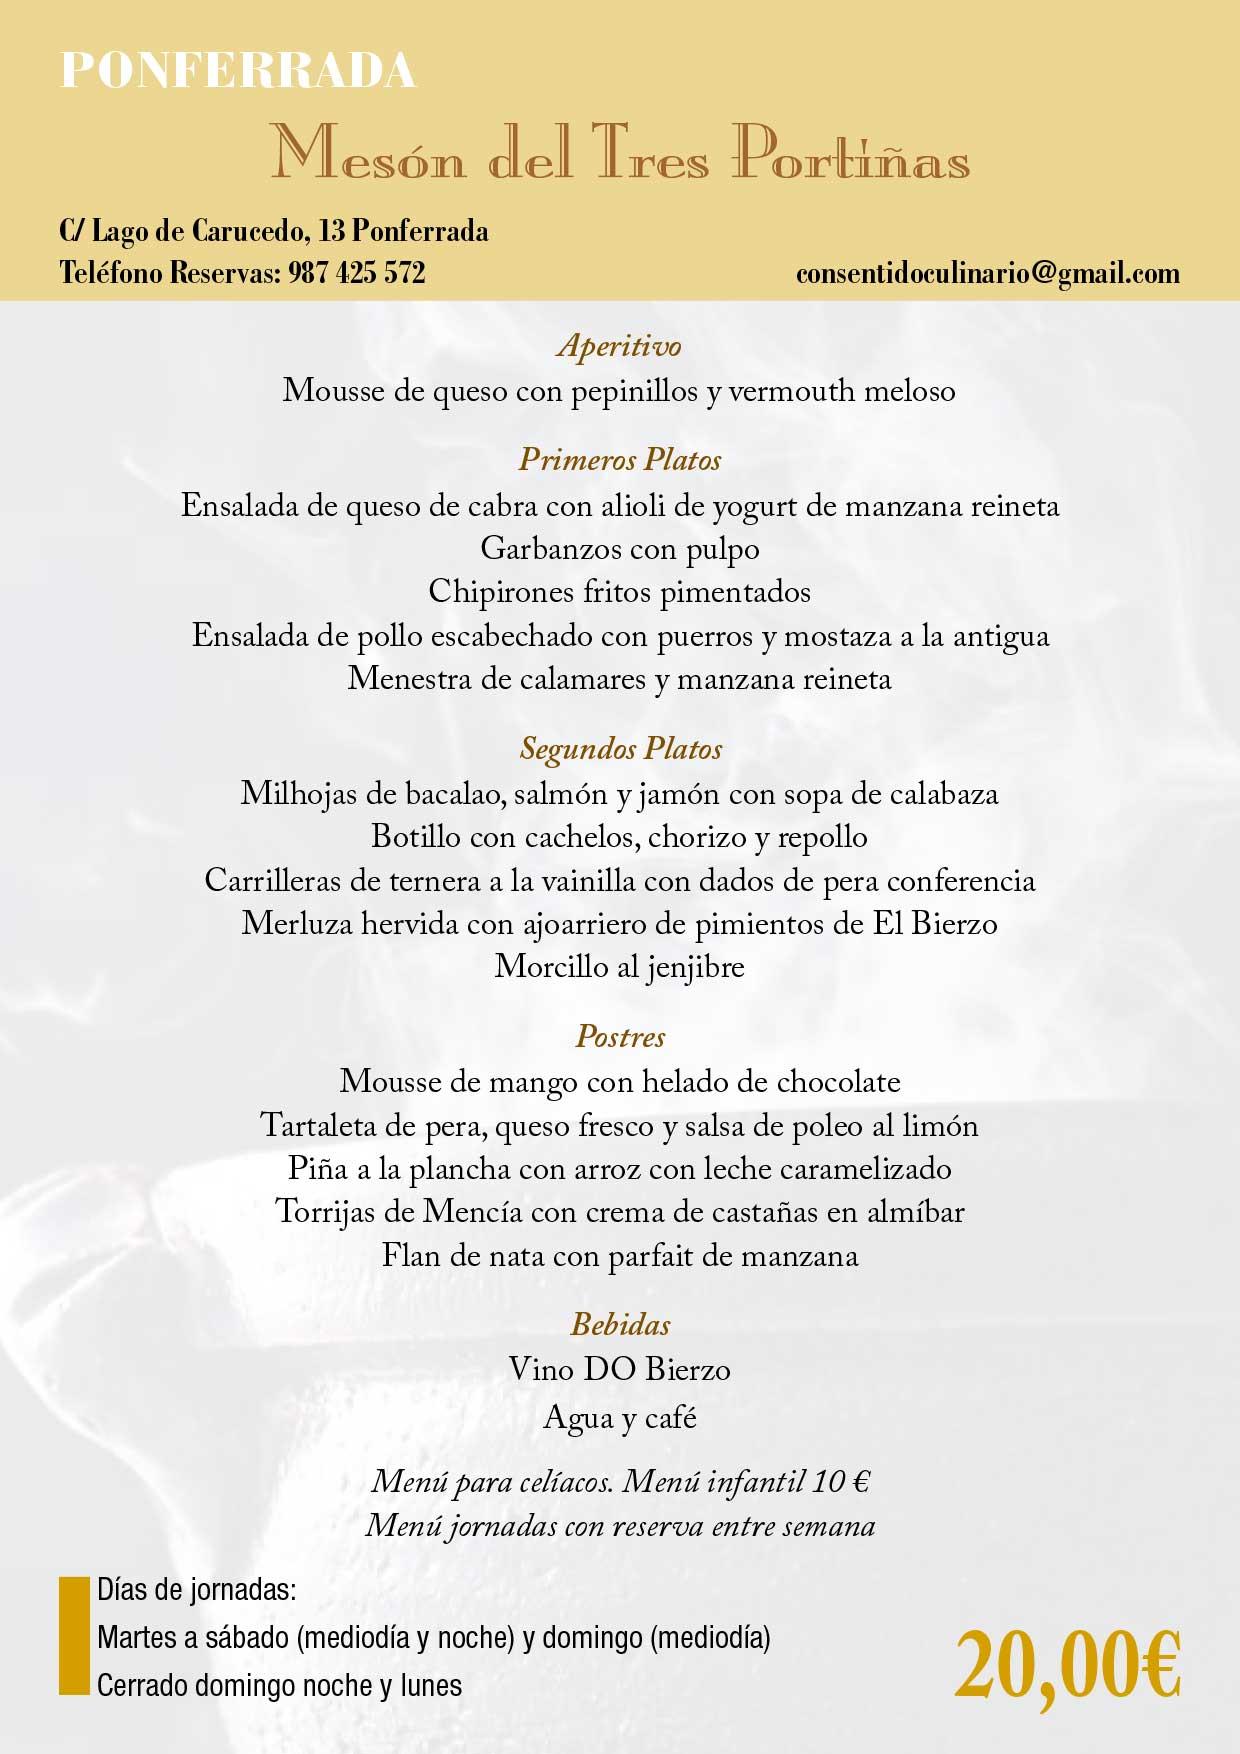 XXXIII Jornadas gastronómicas del Bierzo 2017. Restaurantes participantes 20